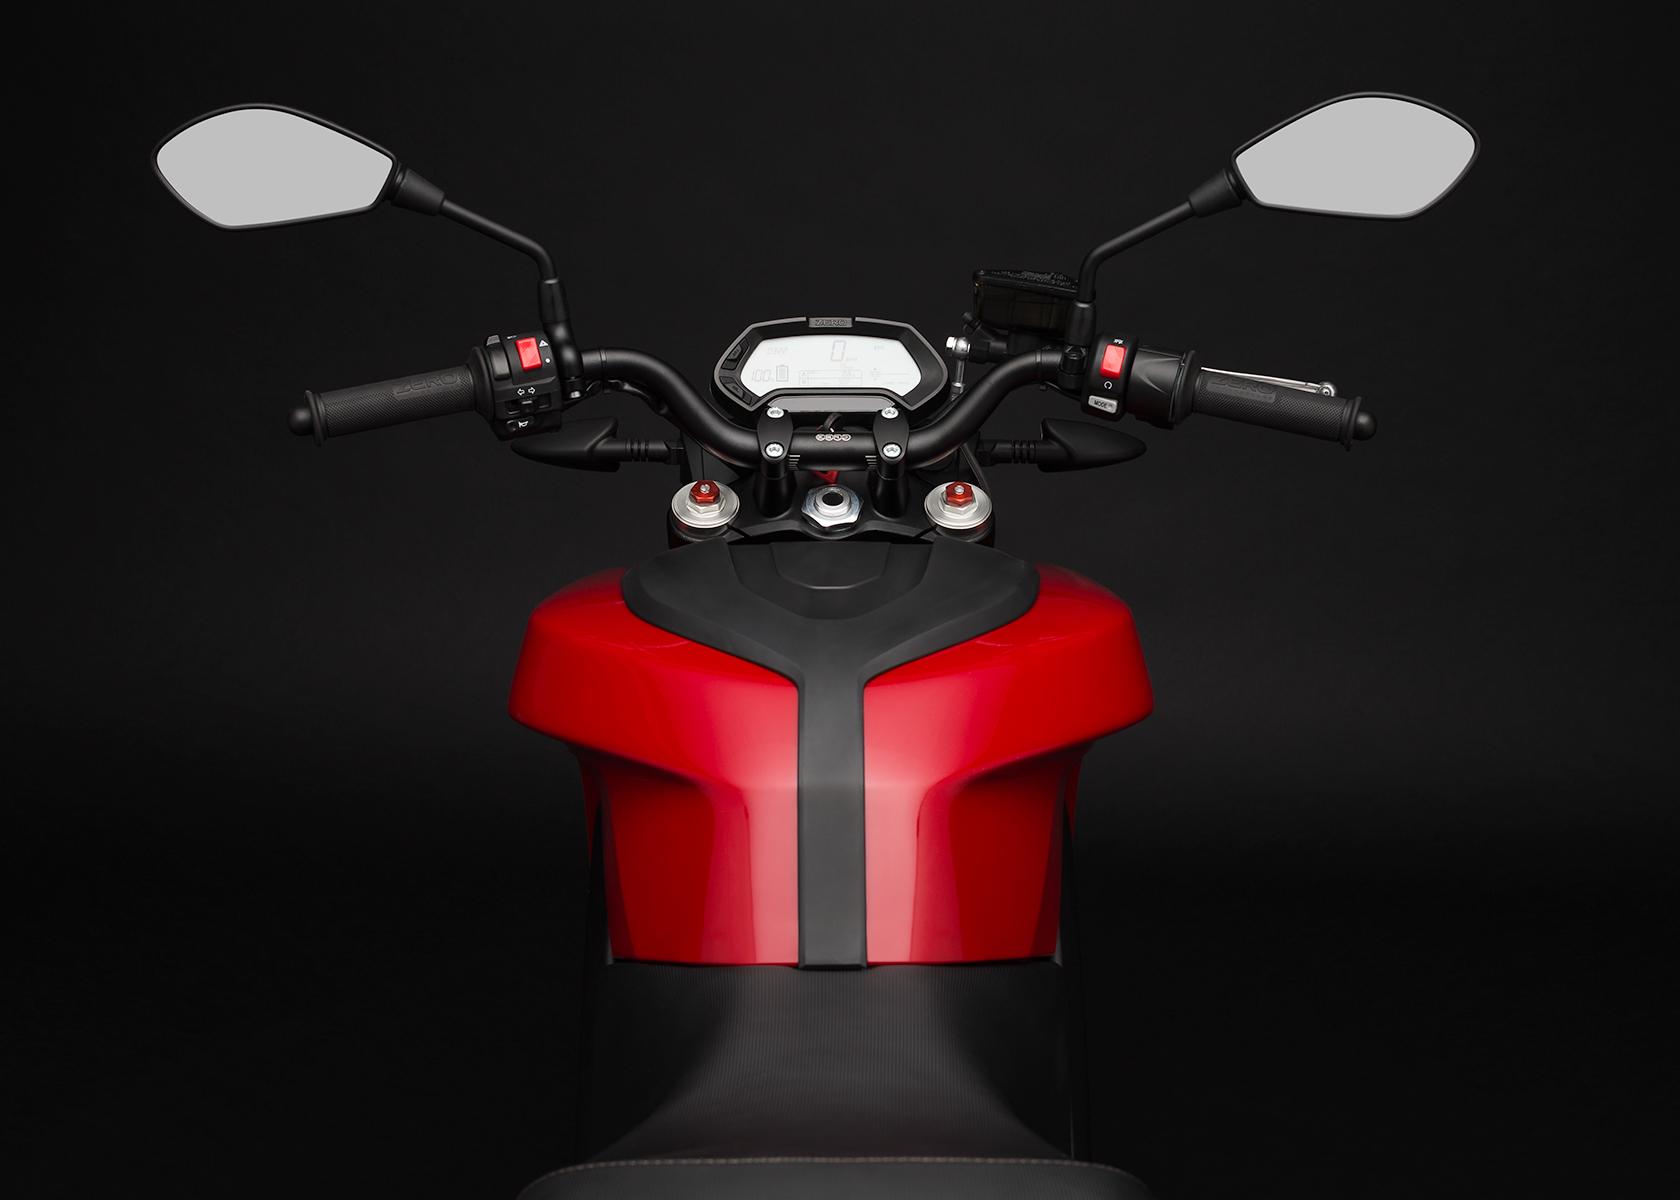 2015 Zero SR Electric Motorcycle: Power Tank